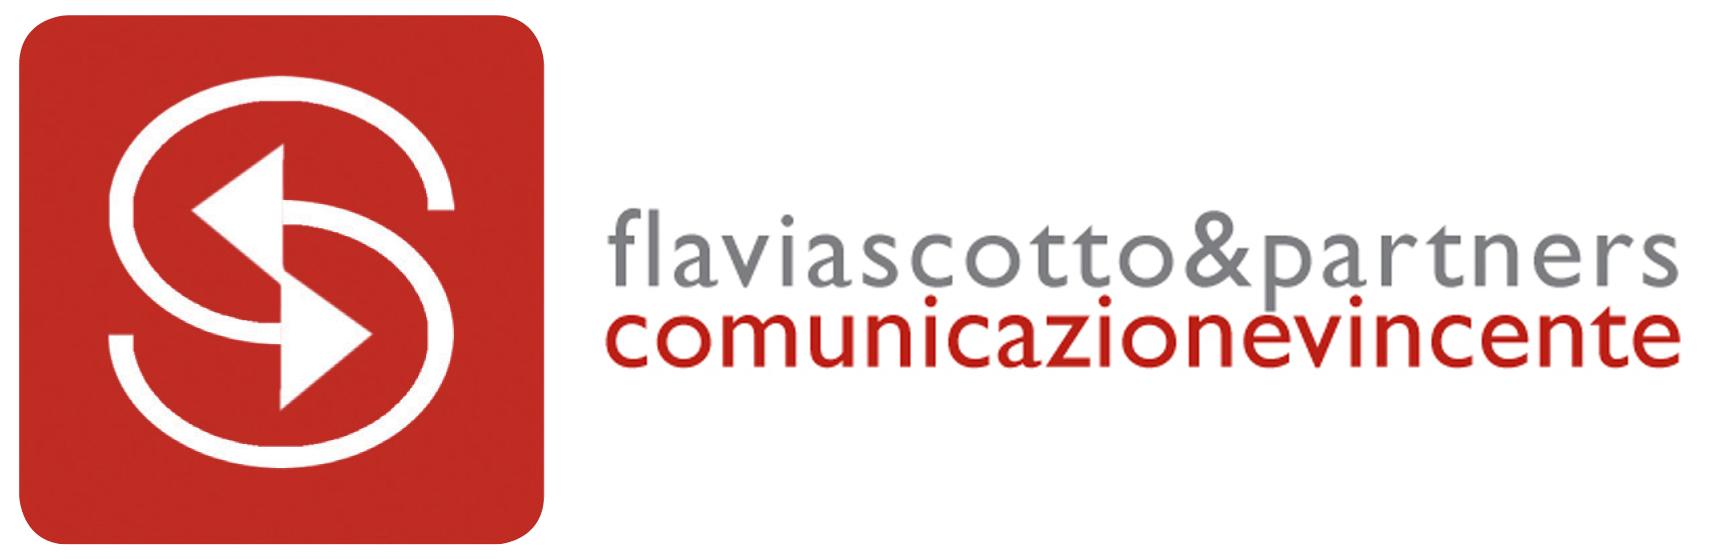 Flavia Scotto & Partners